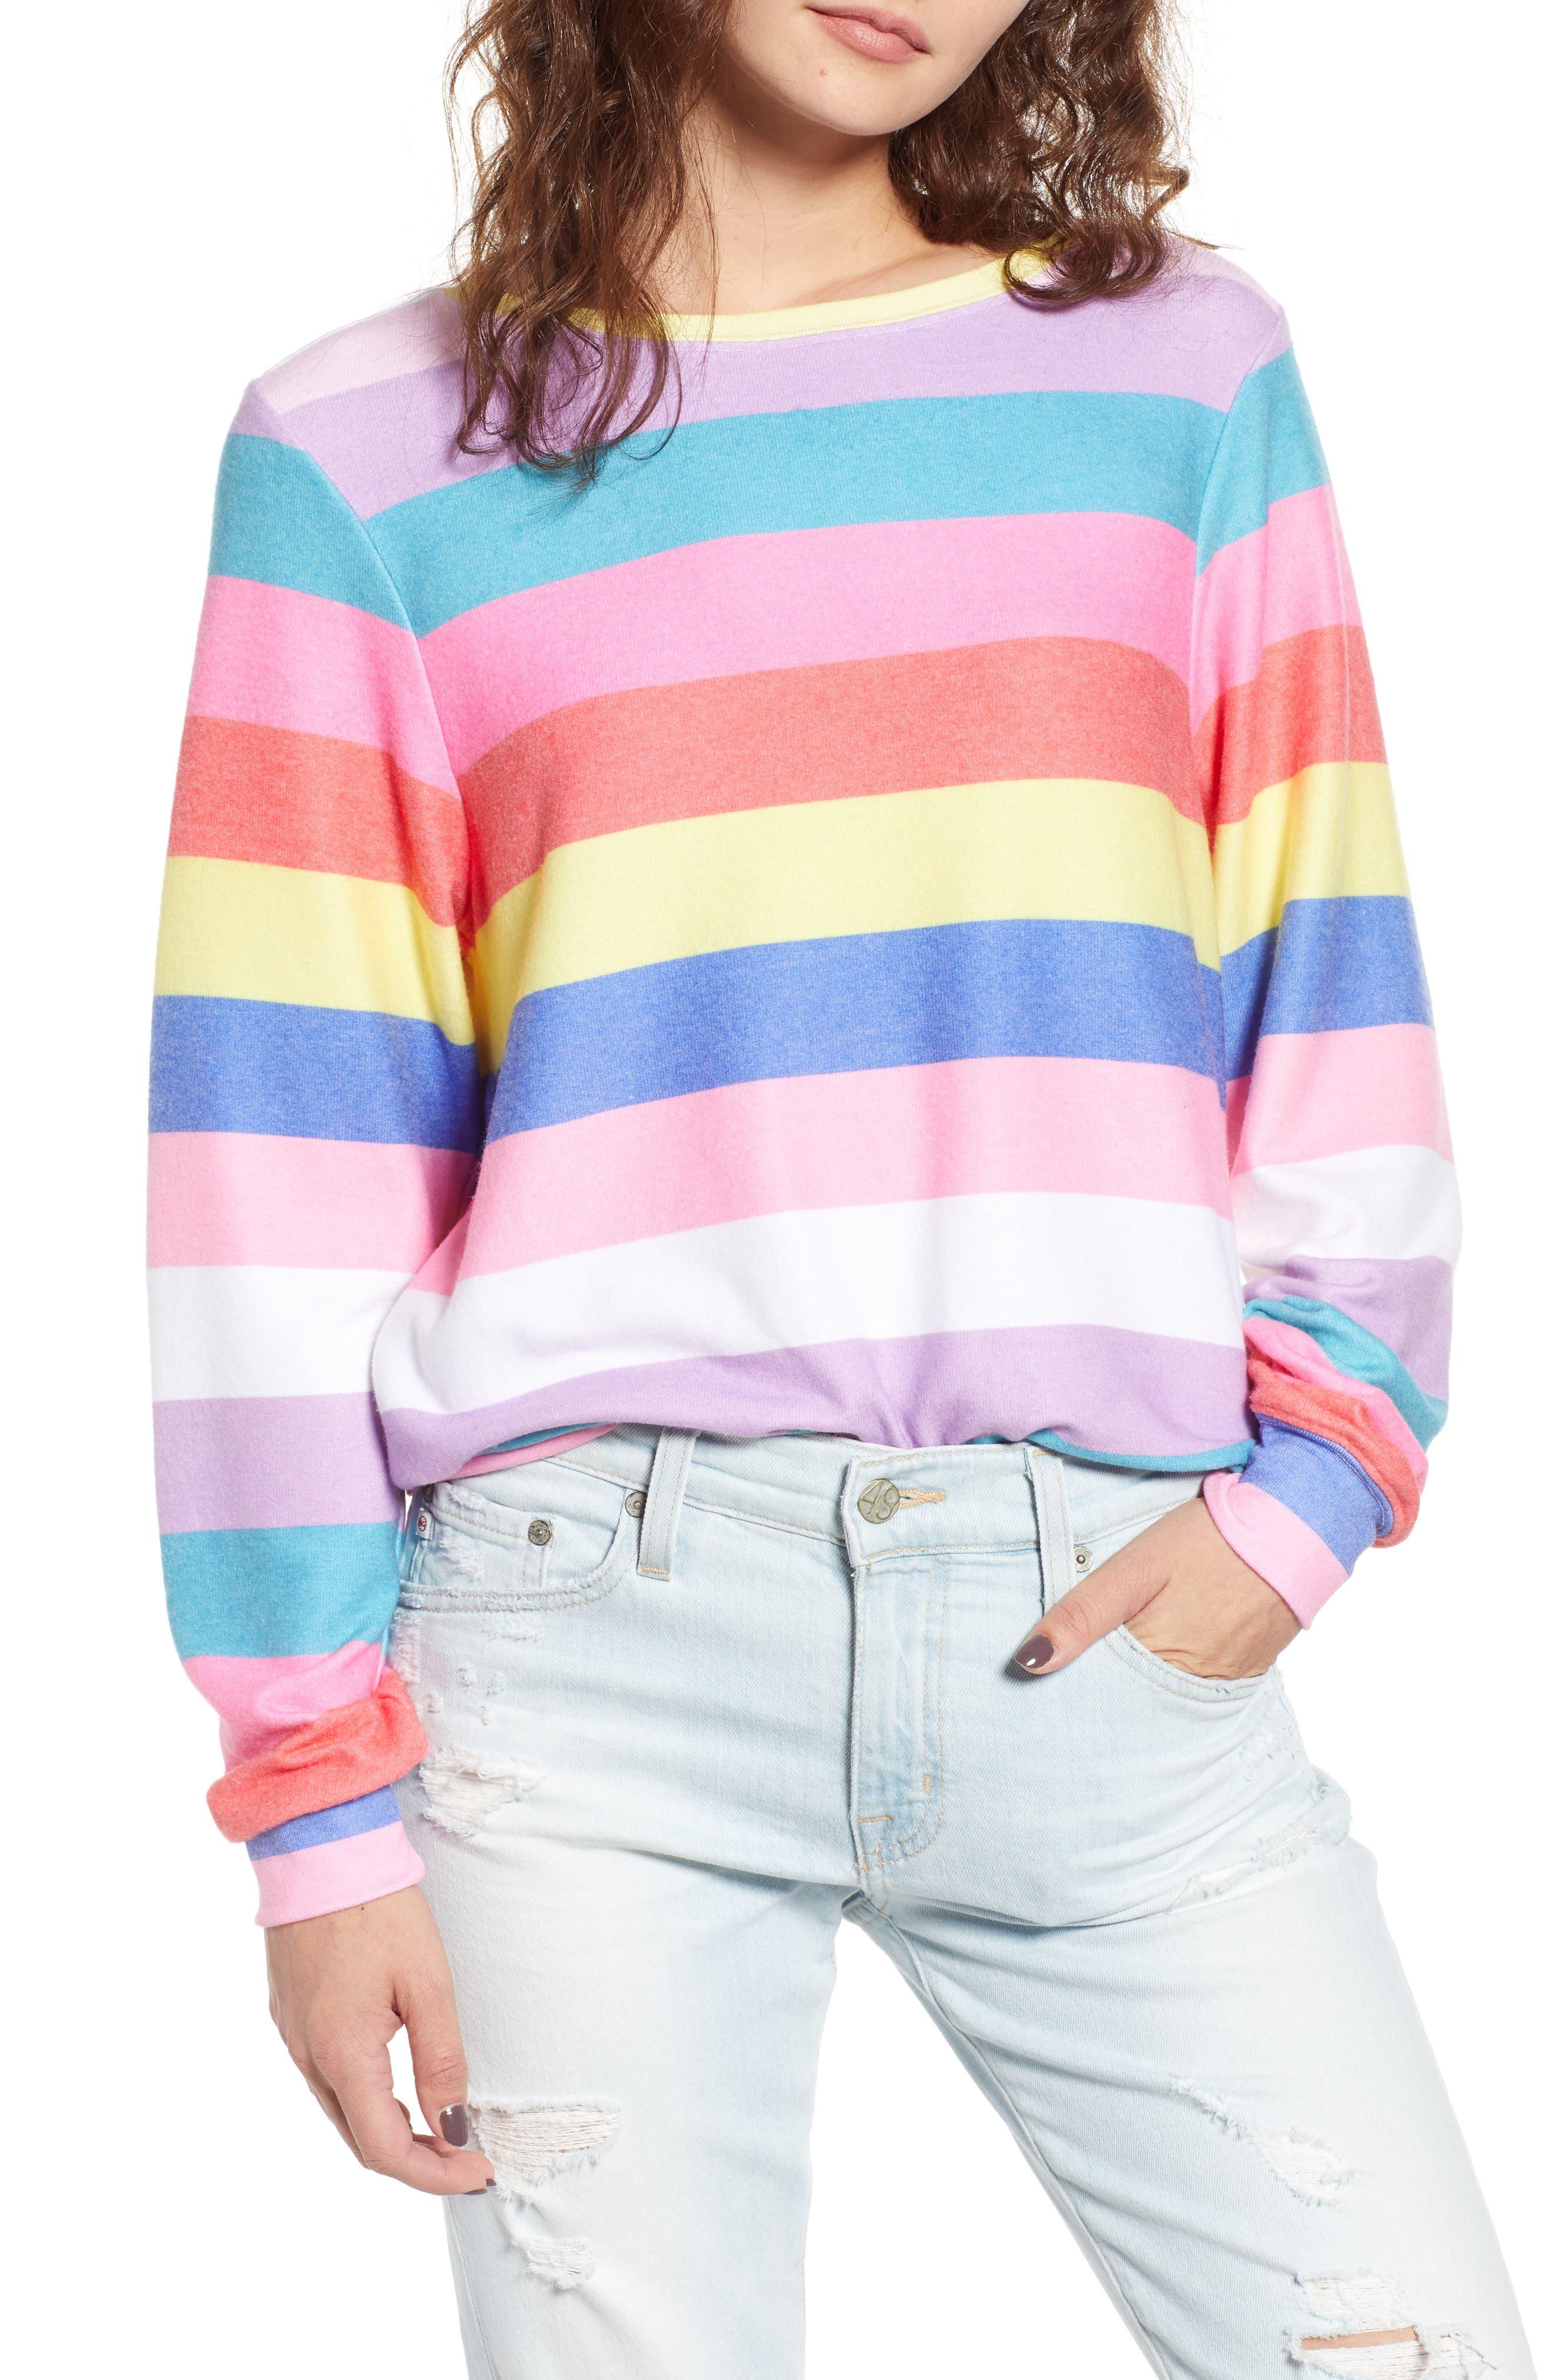 Castaway Roadtrip Sweatshirt,                         Main,                         color, Multi Colored